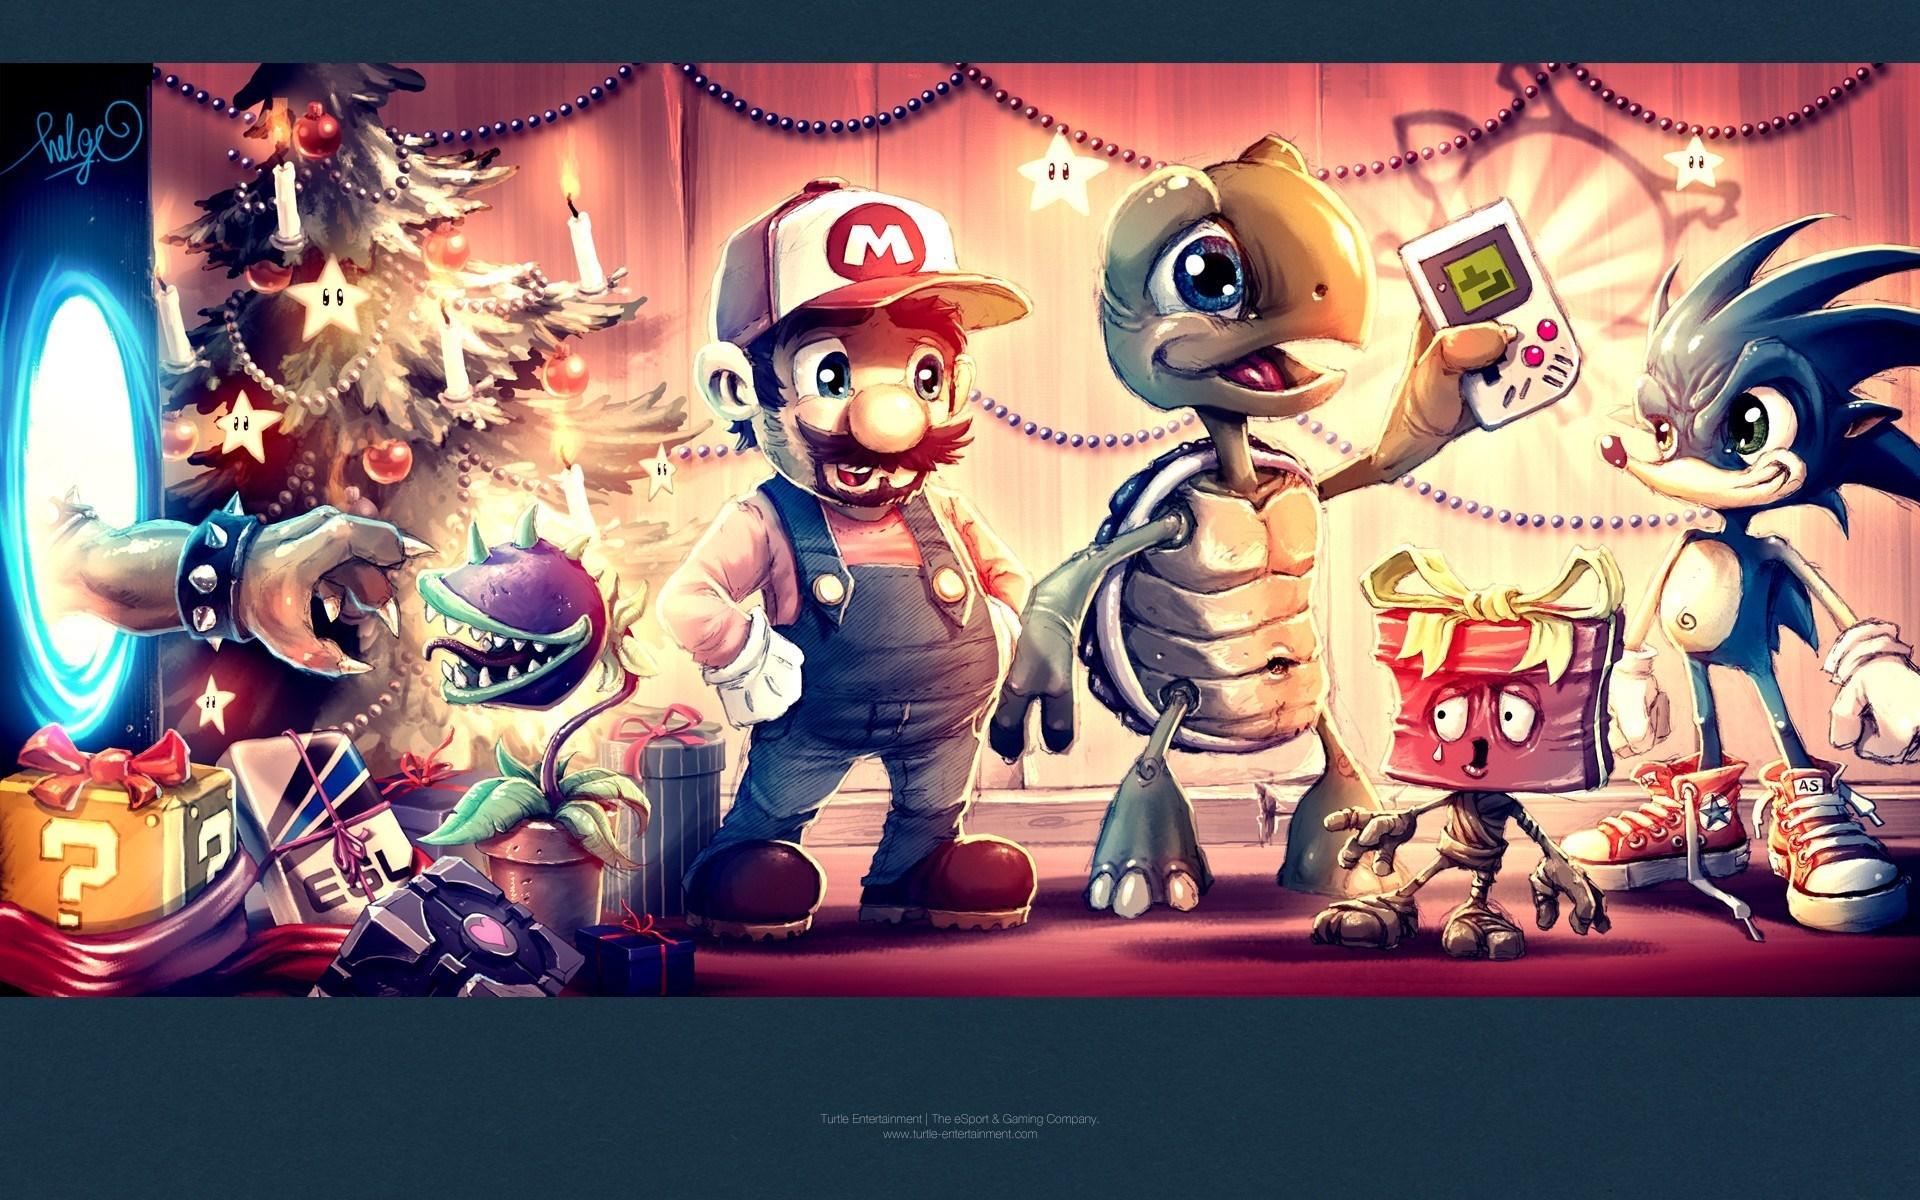 Video Games Portal Tetris Super Mario Companion Cube Christmas Bowser Plants vs Zombies Sonic Game Boy Art